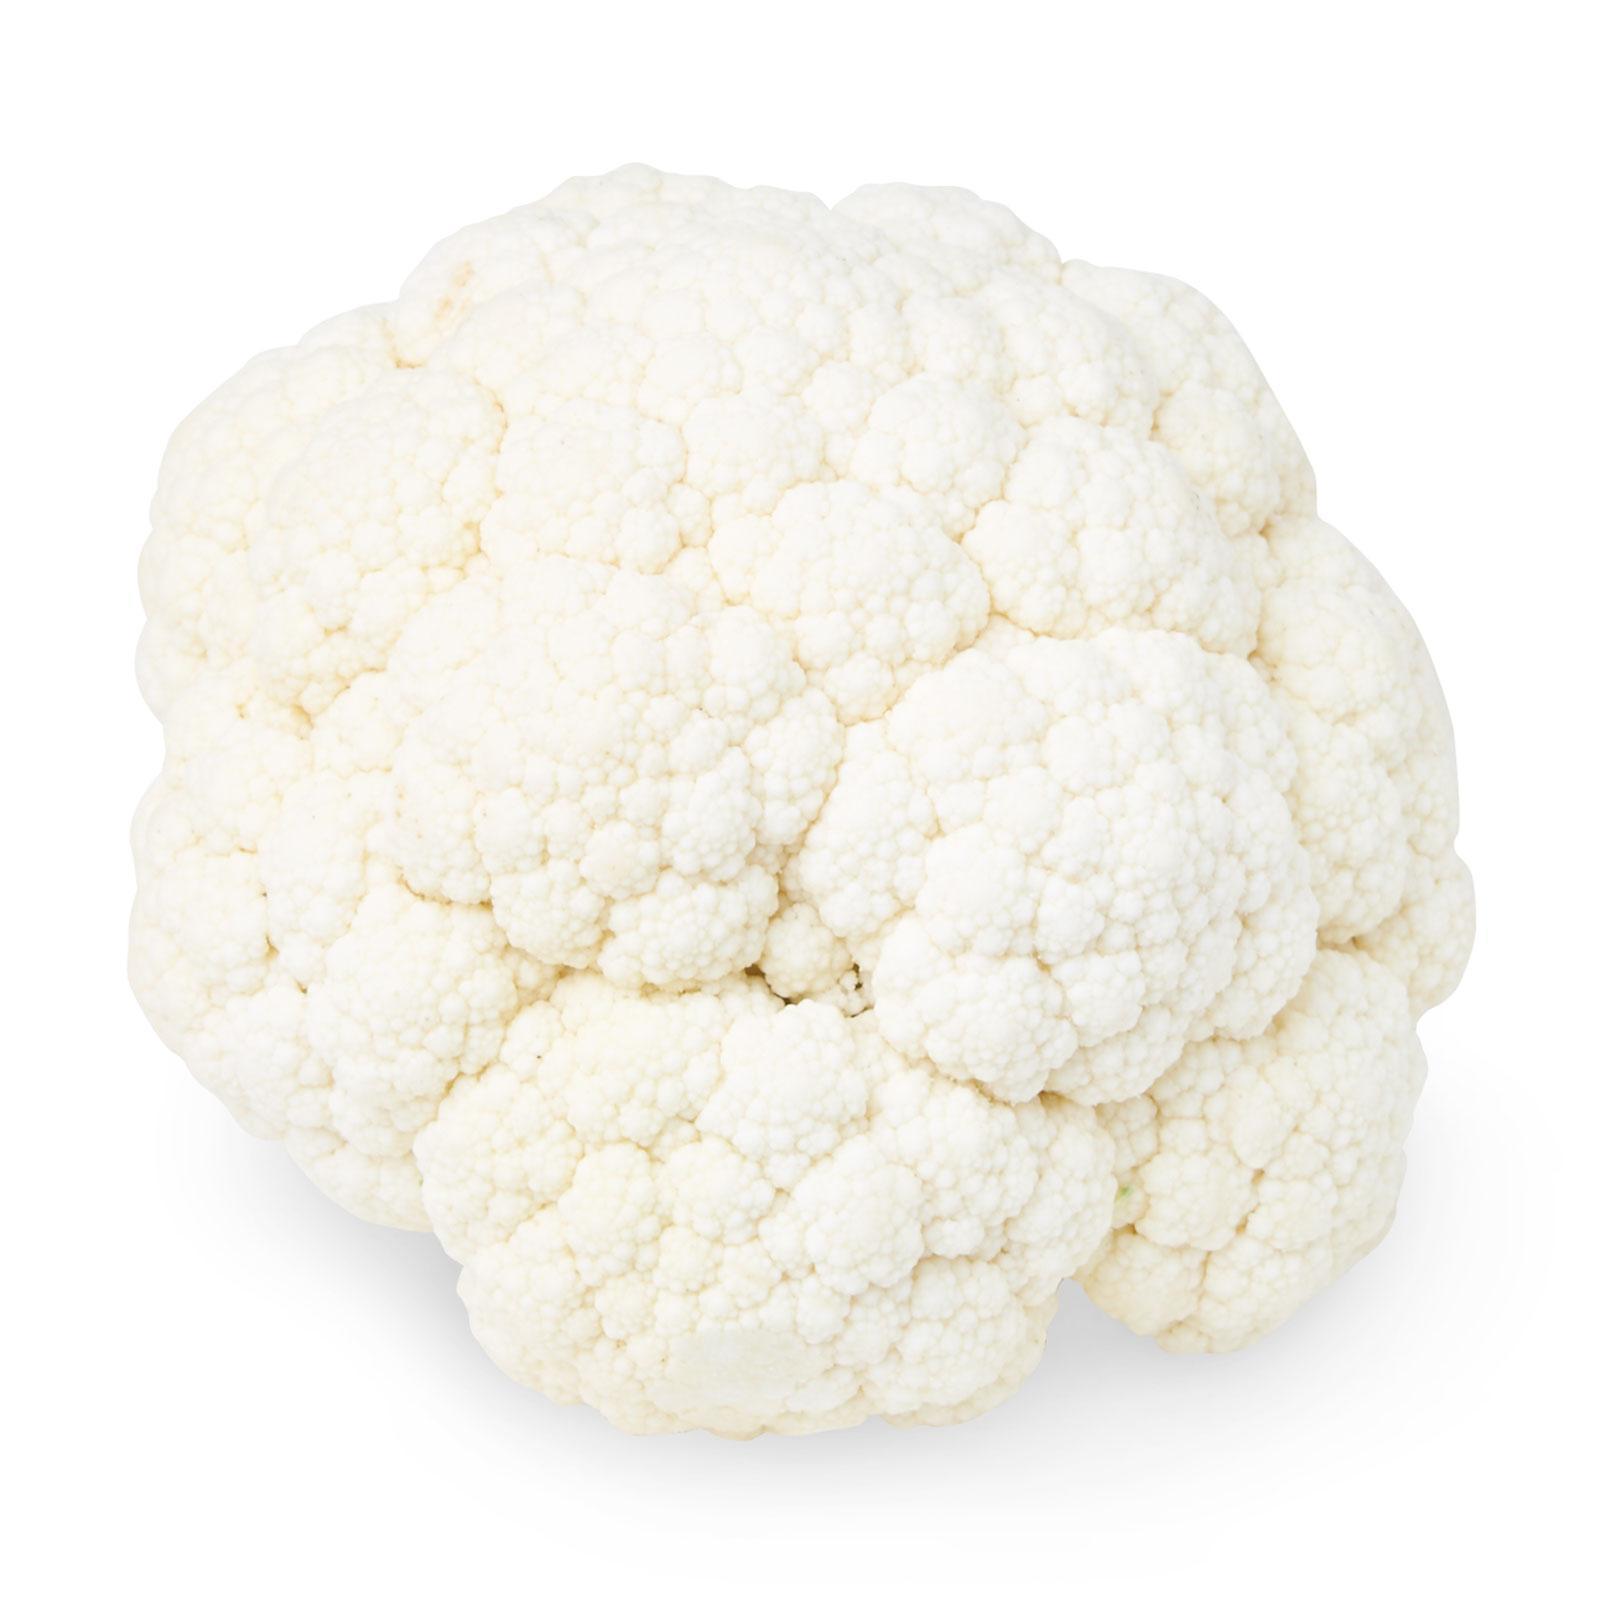 YUVVO Cauliflower